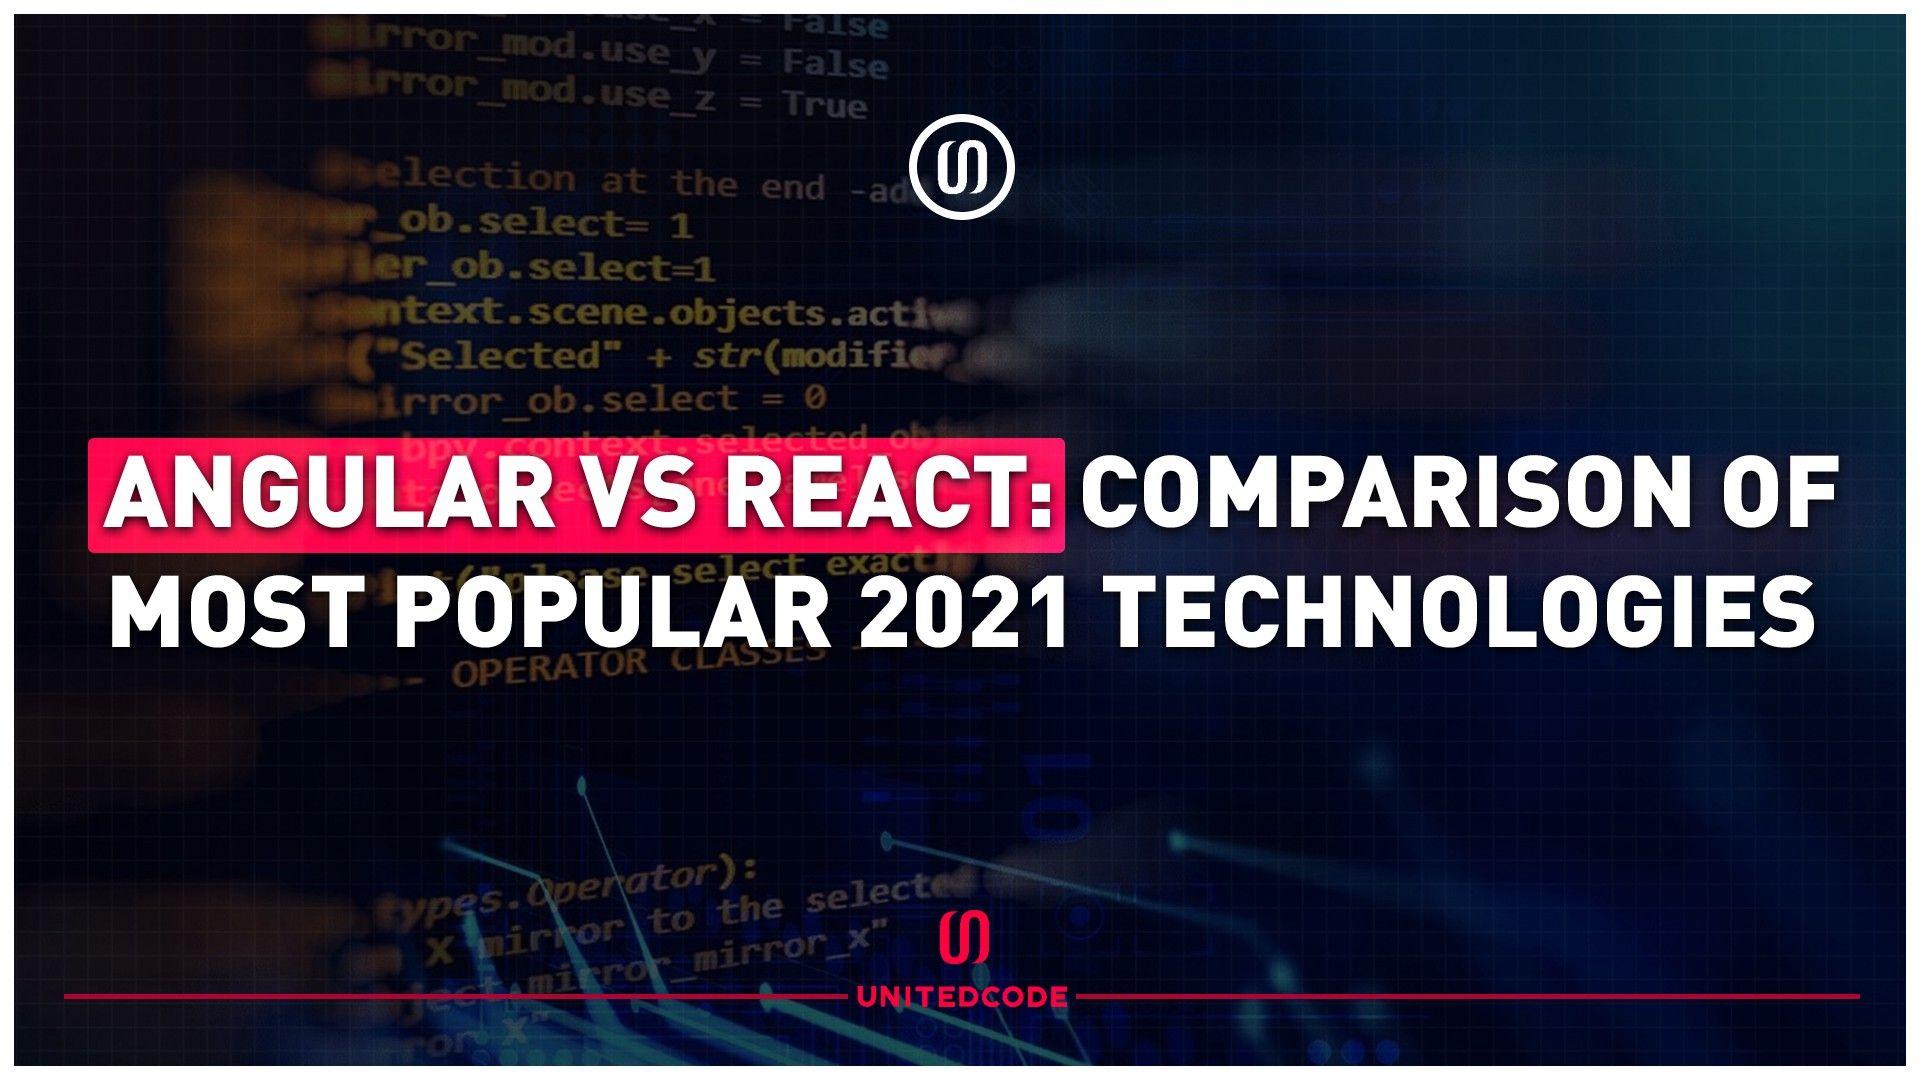 Angular vs React: Comparison of Most Popular 2021 Technologies